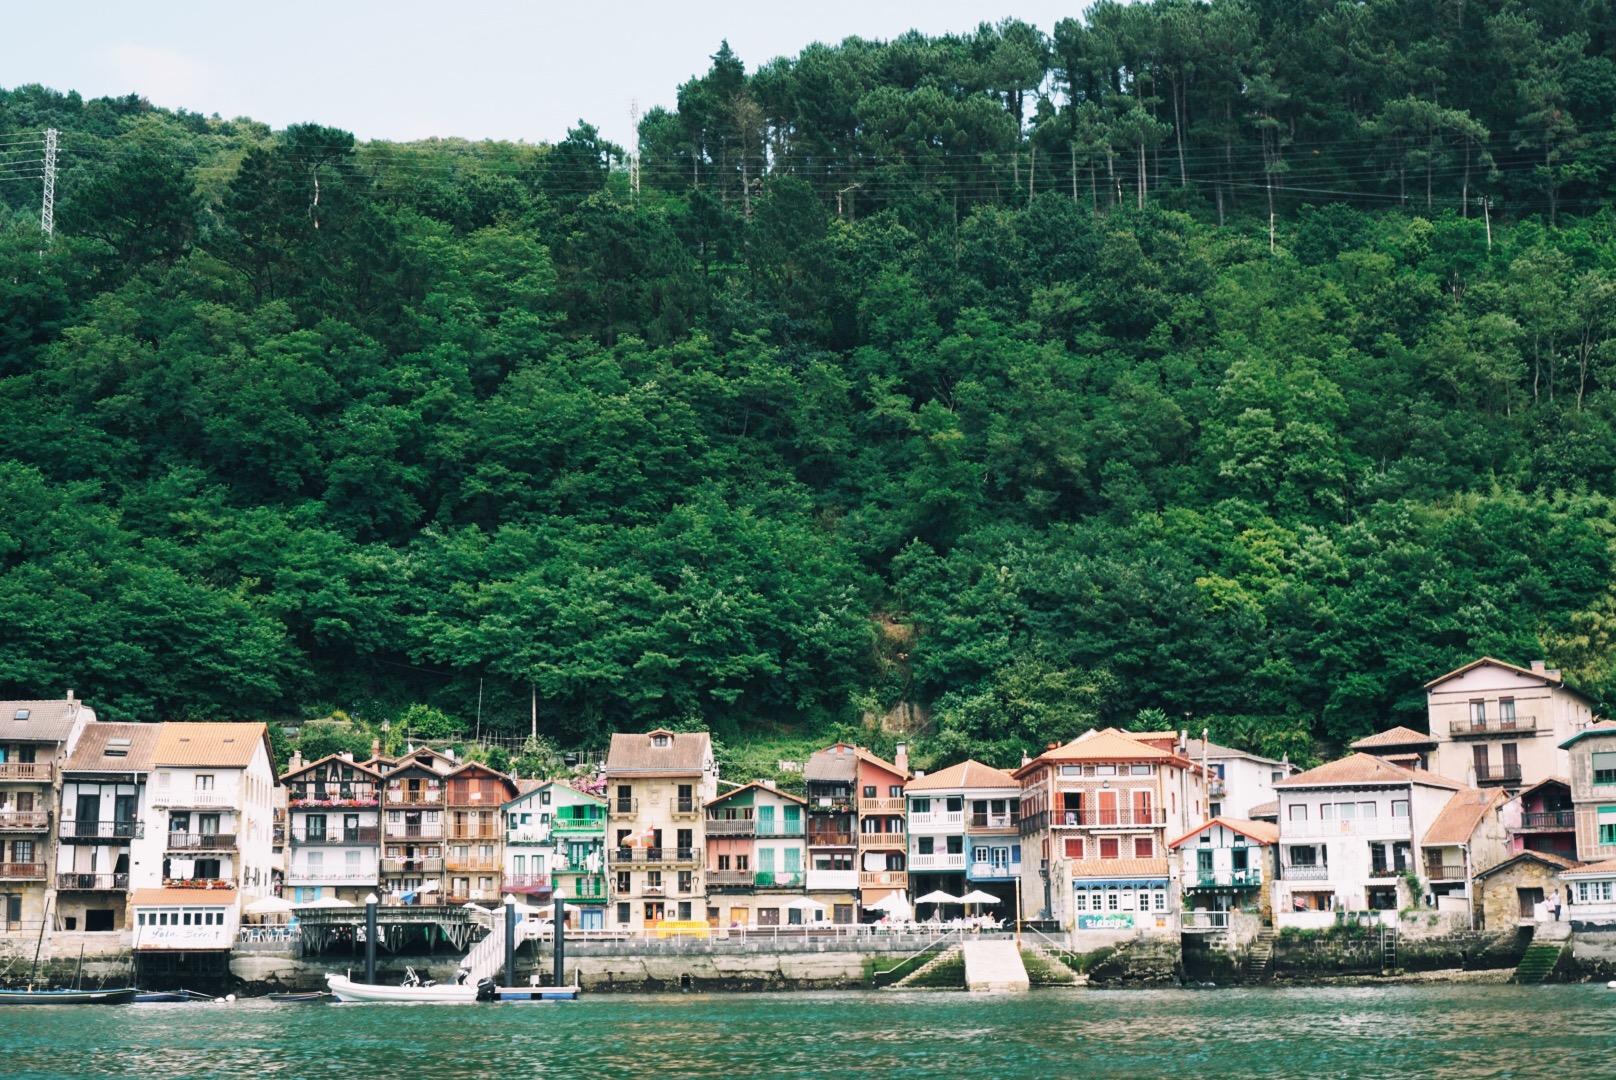 village of Pasajes de San Juan from ferry